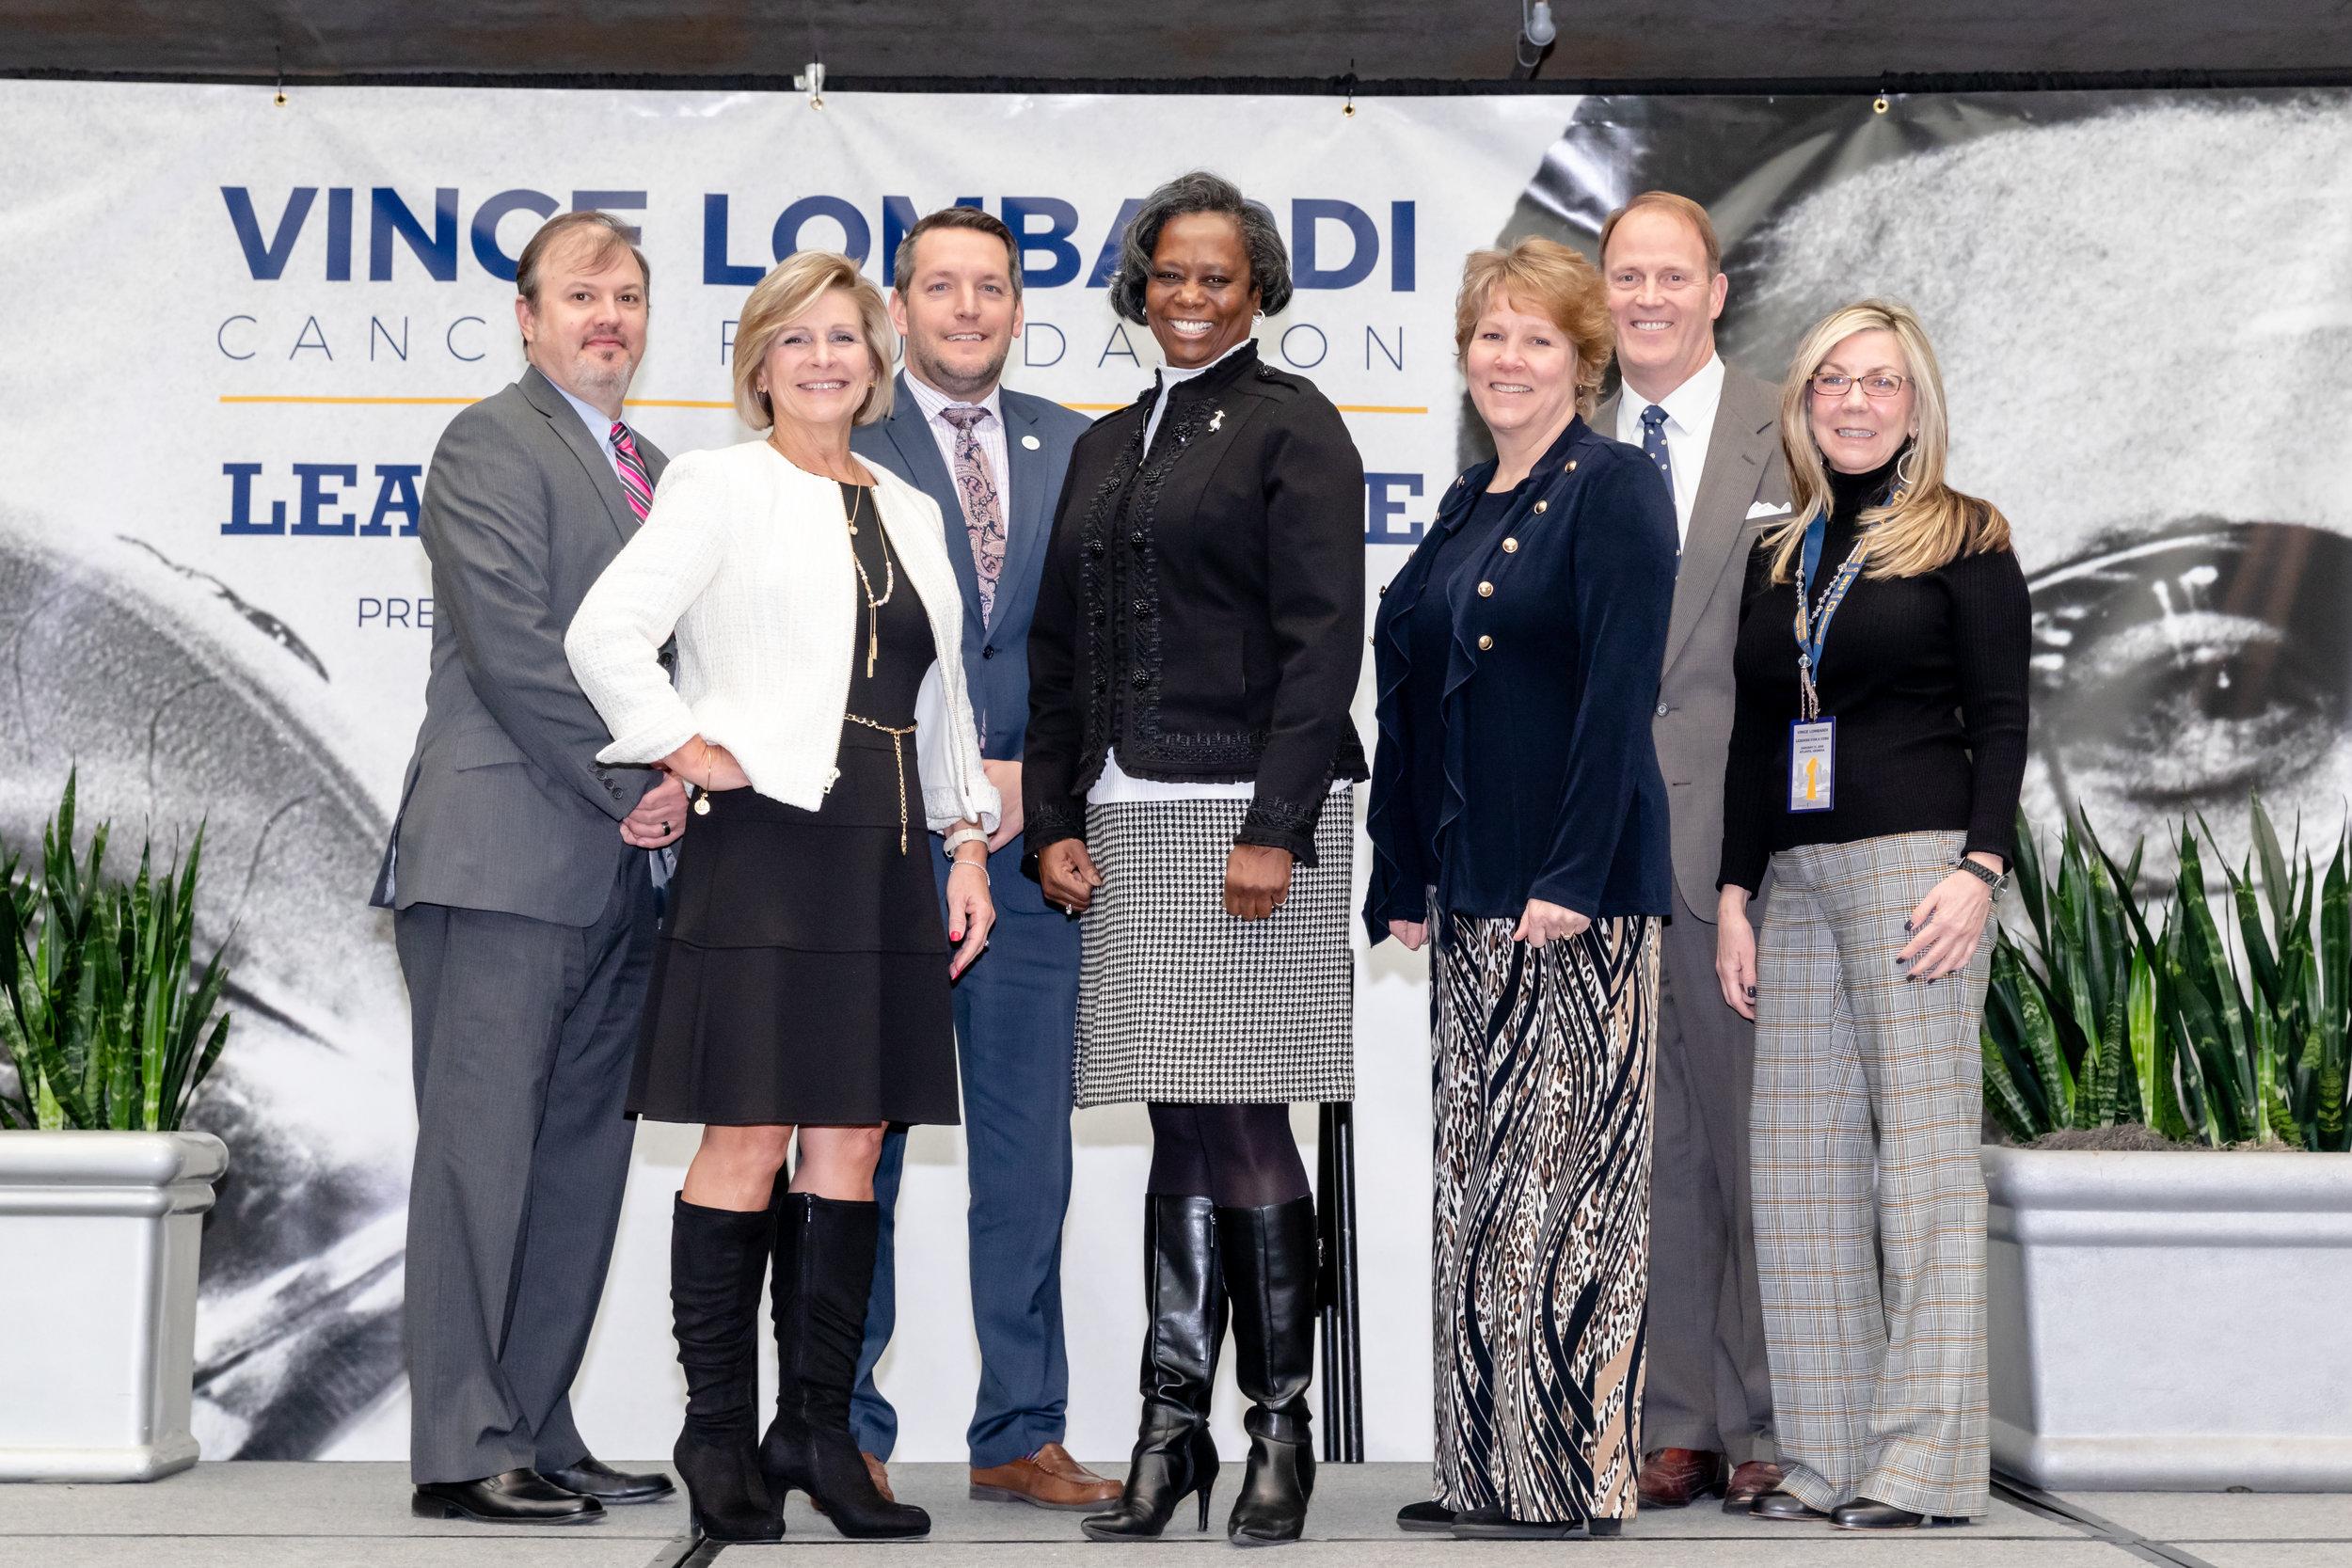 Vince Lombardi Cancer Foundation Event -20190131-0460.jpg